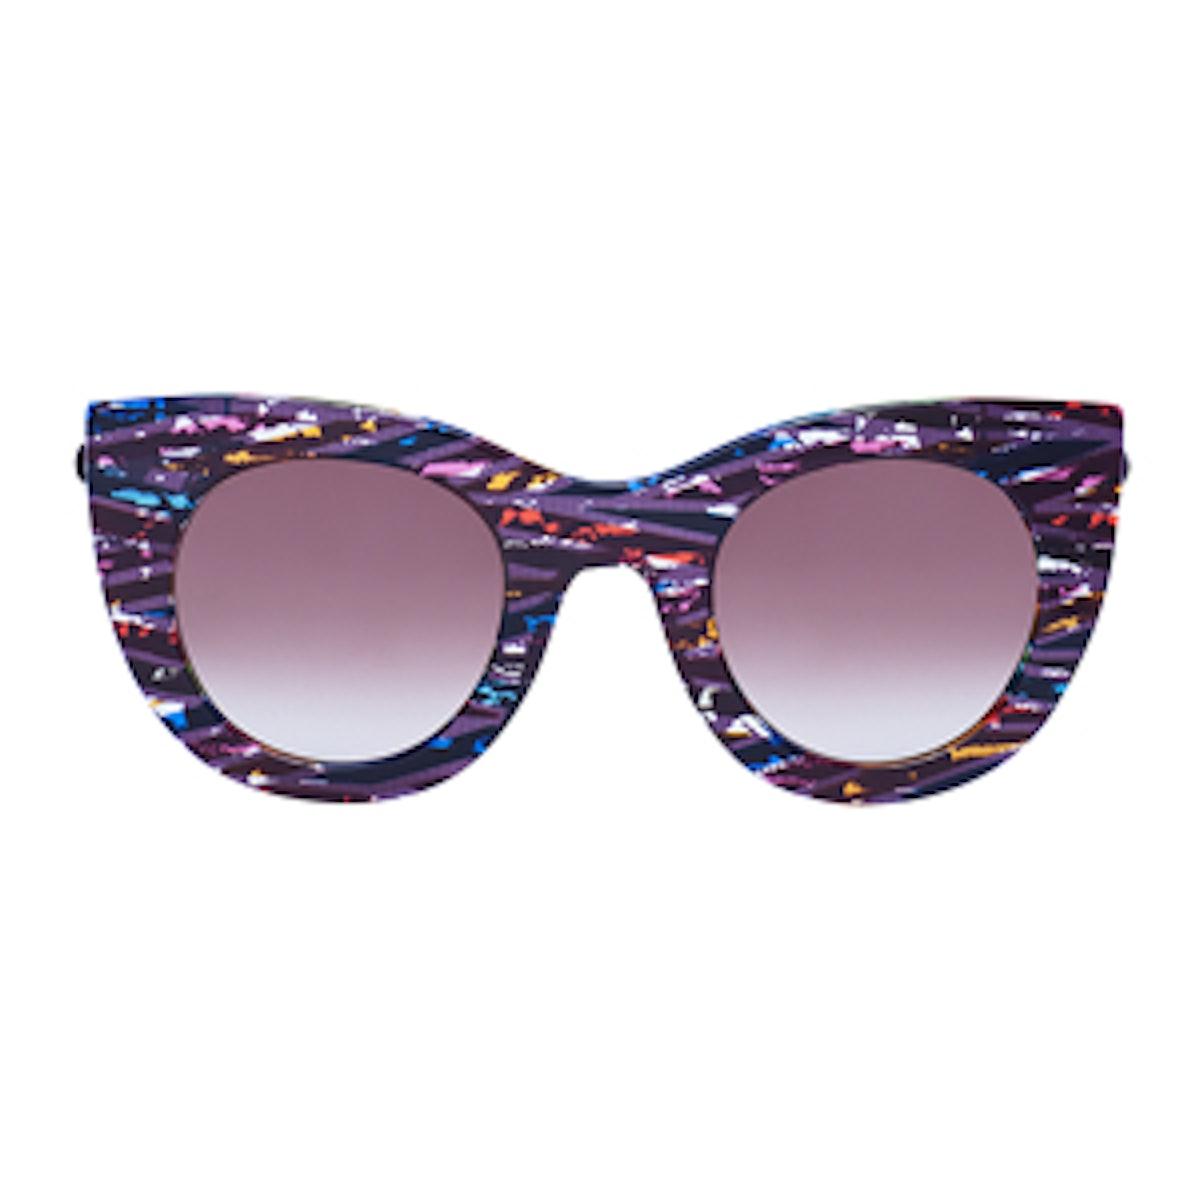 Divinity Sunglasses